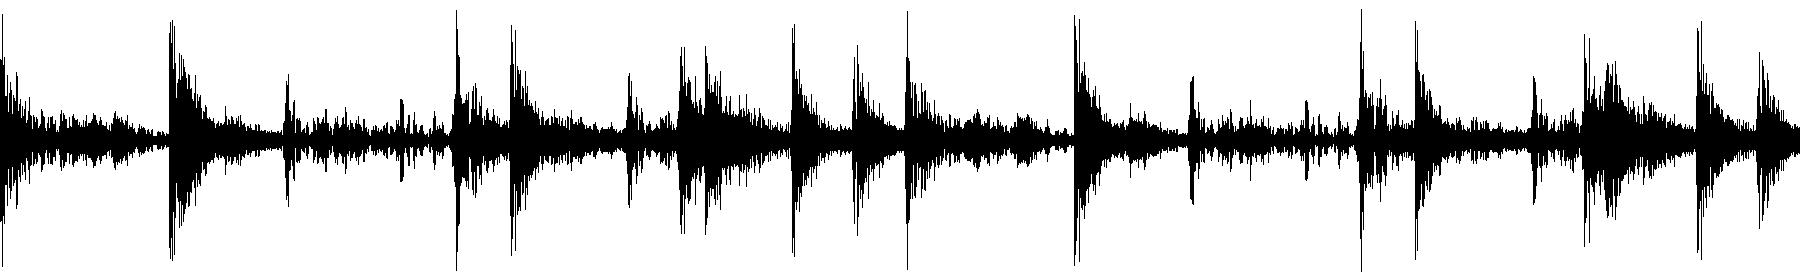 blbc jazzydrums 130 04